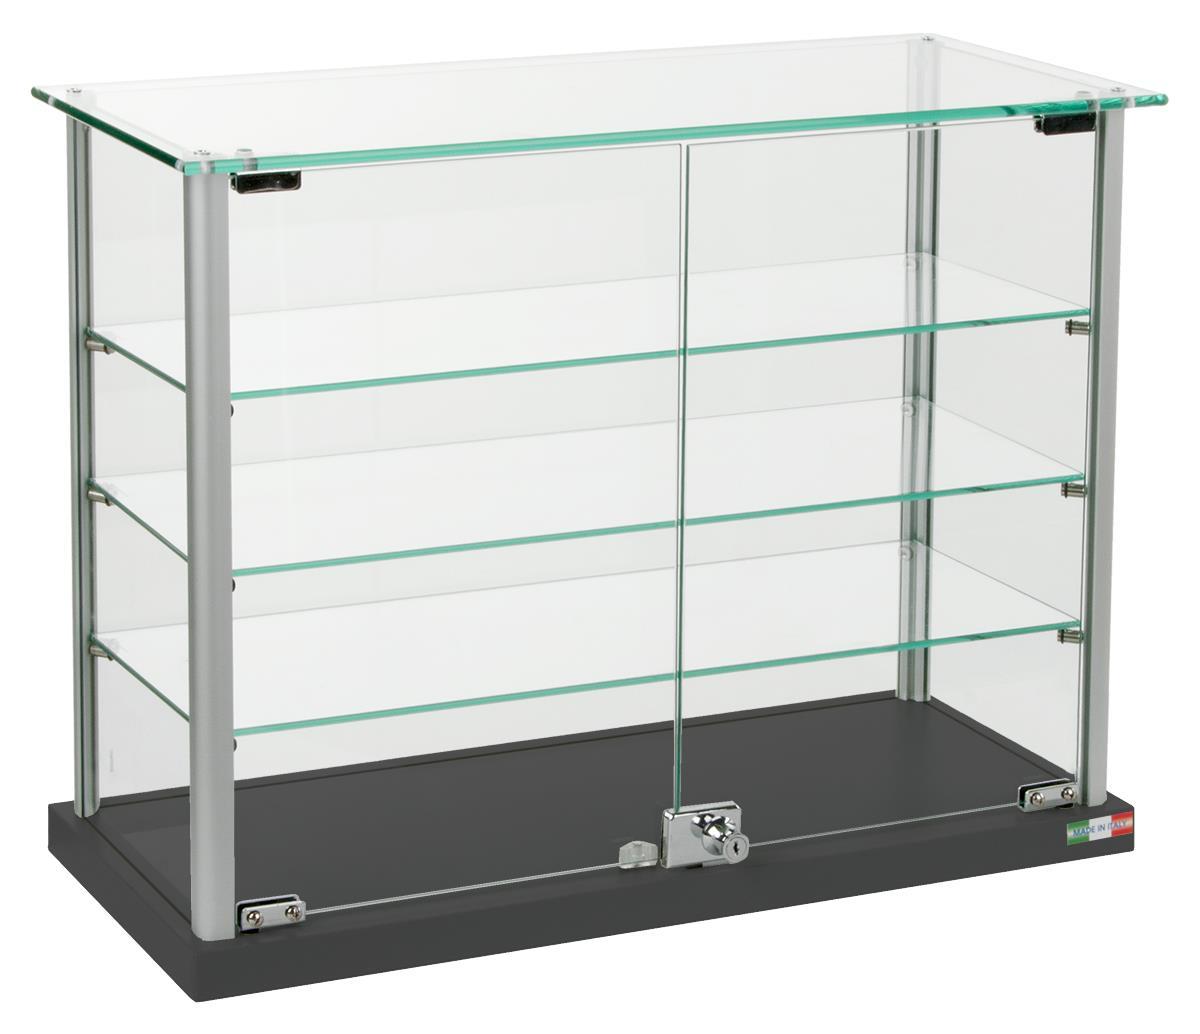 Countertop Display Case (3) Height Adjustable Shelves